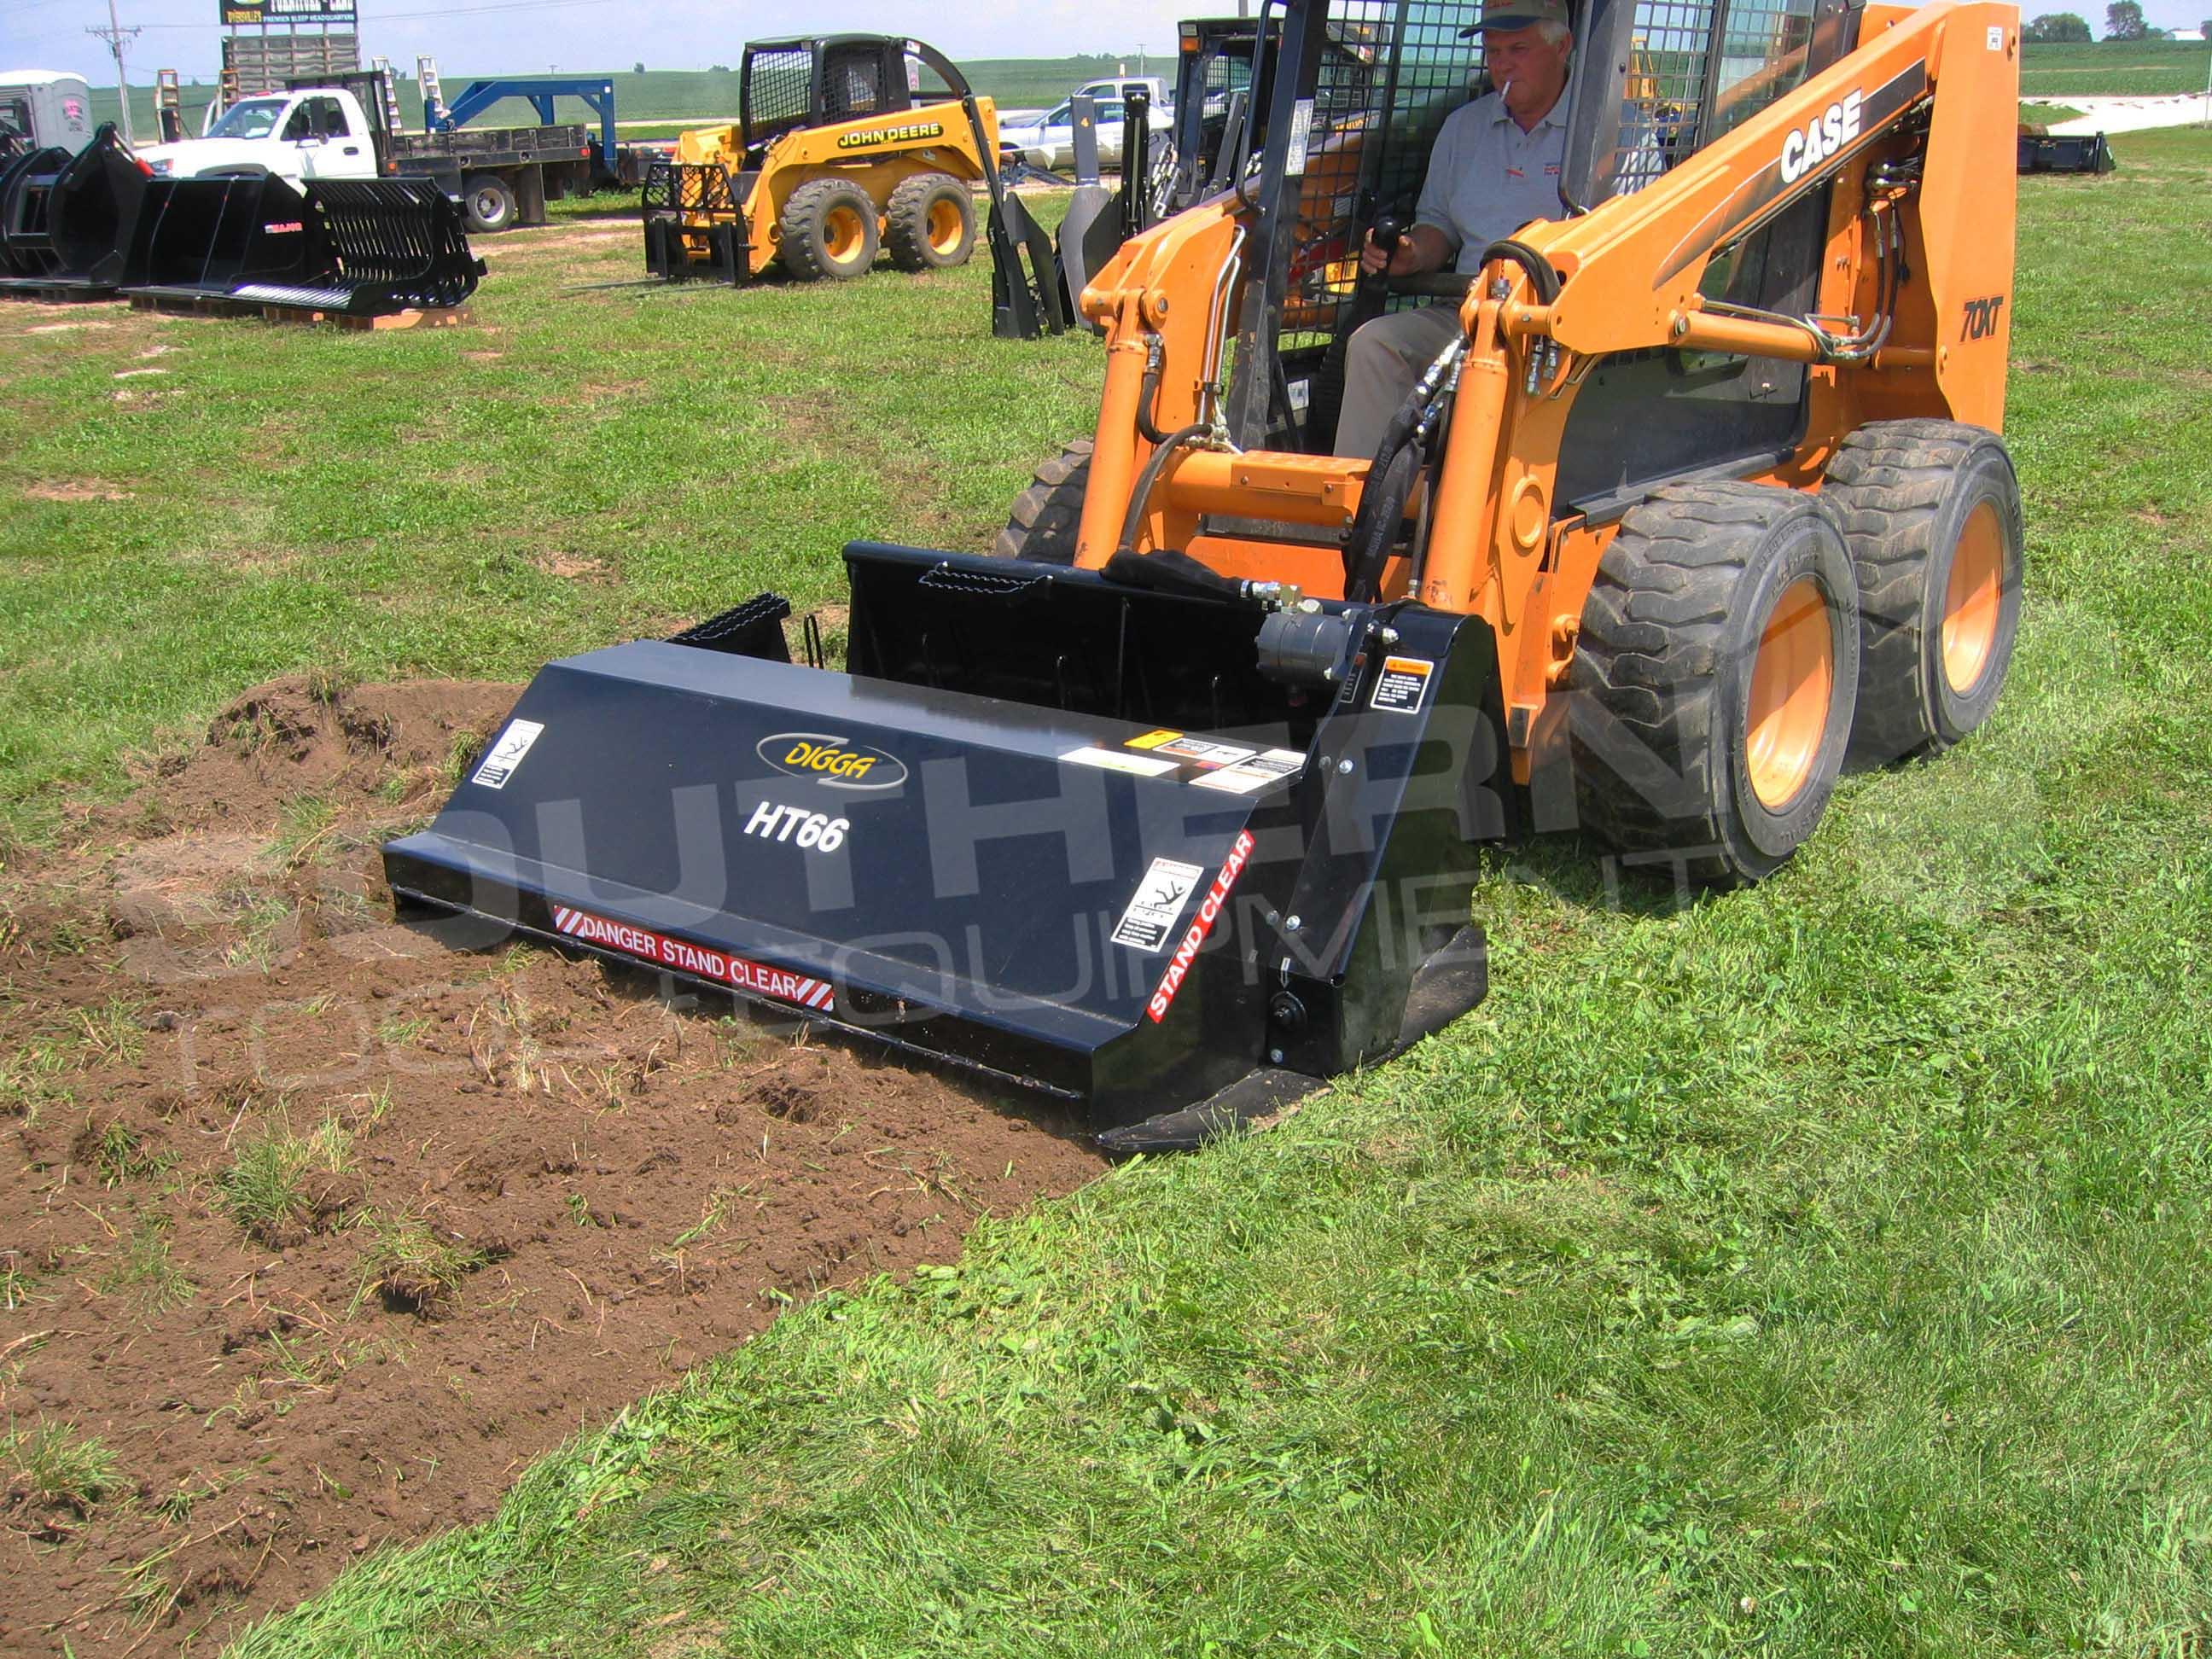 Digga Skid Steer Rotary Tiller Southern Tool Equipment